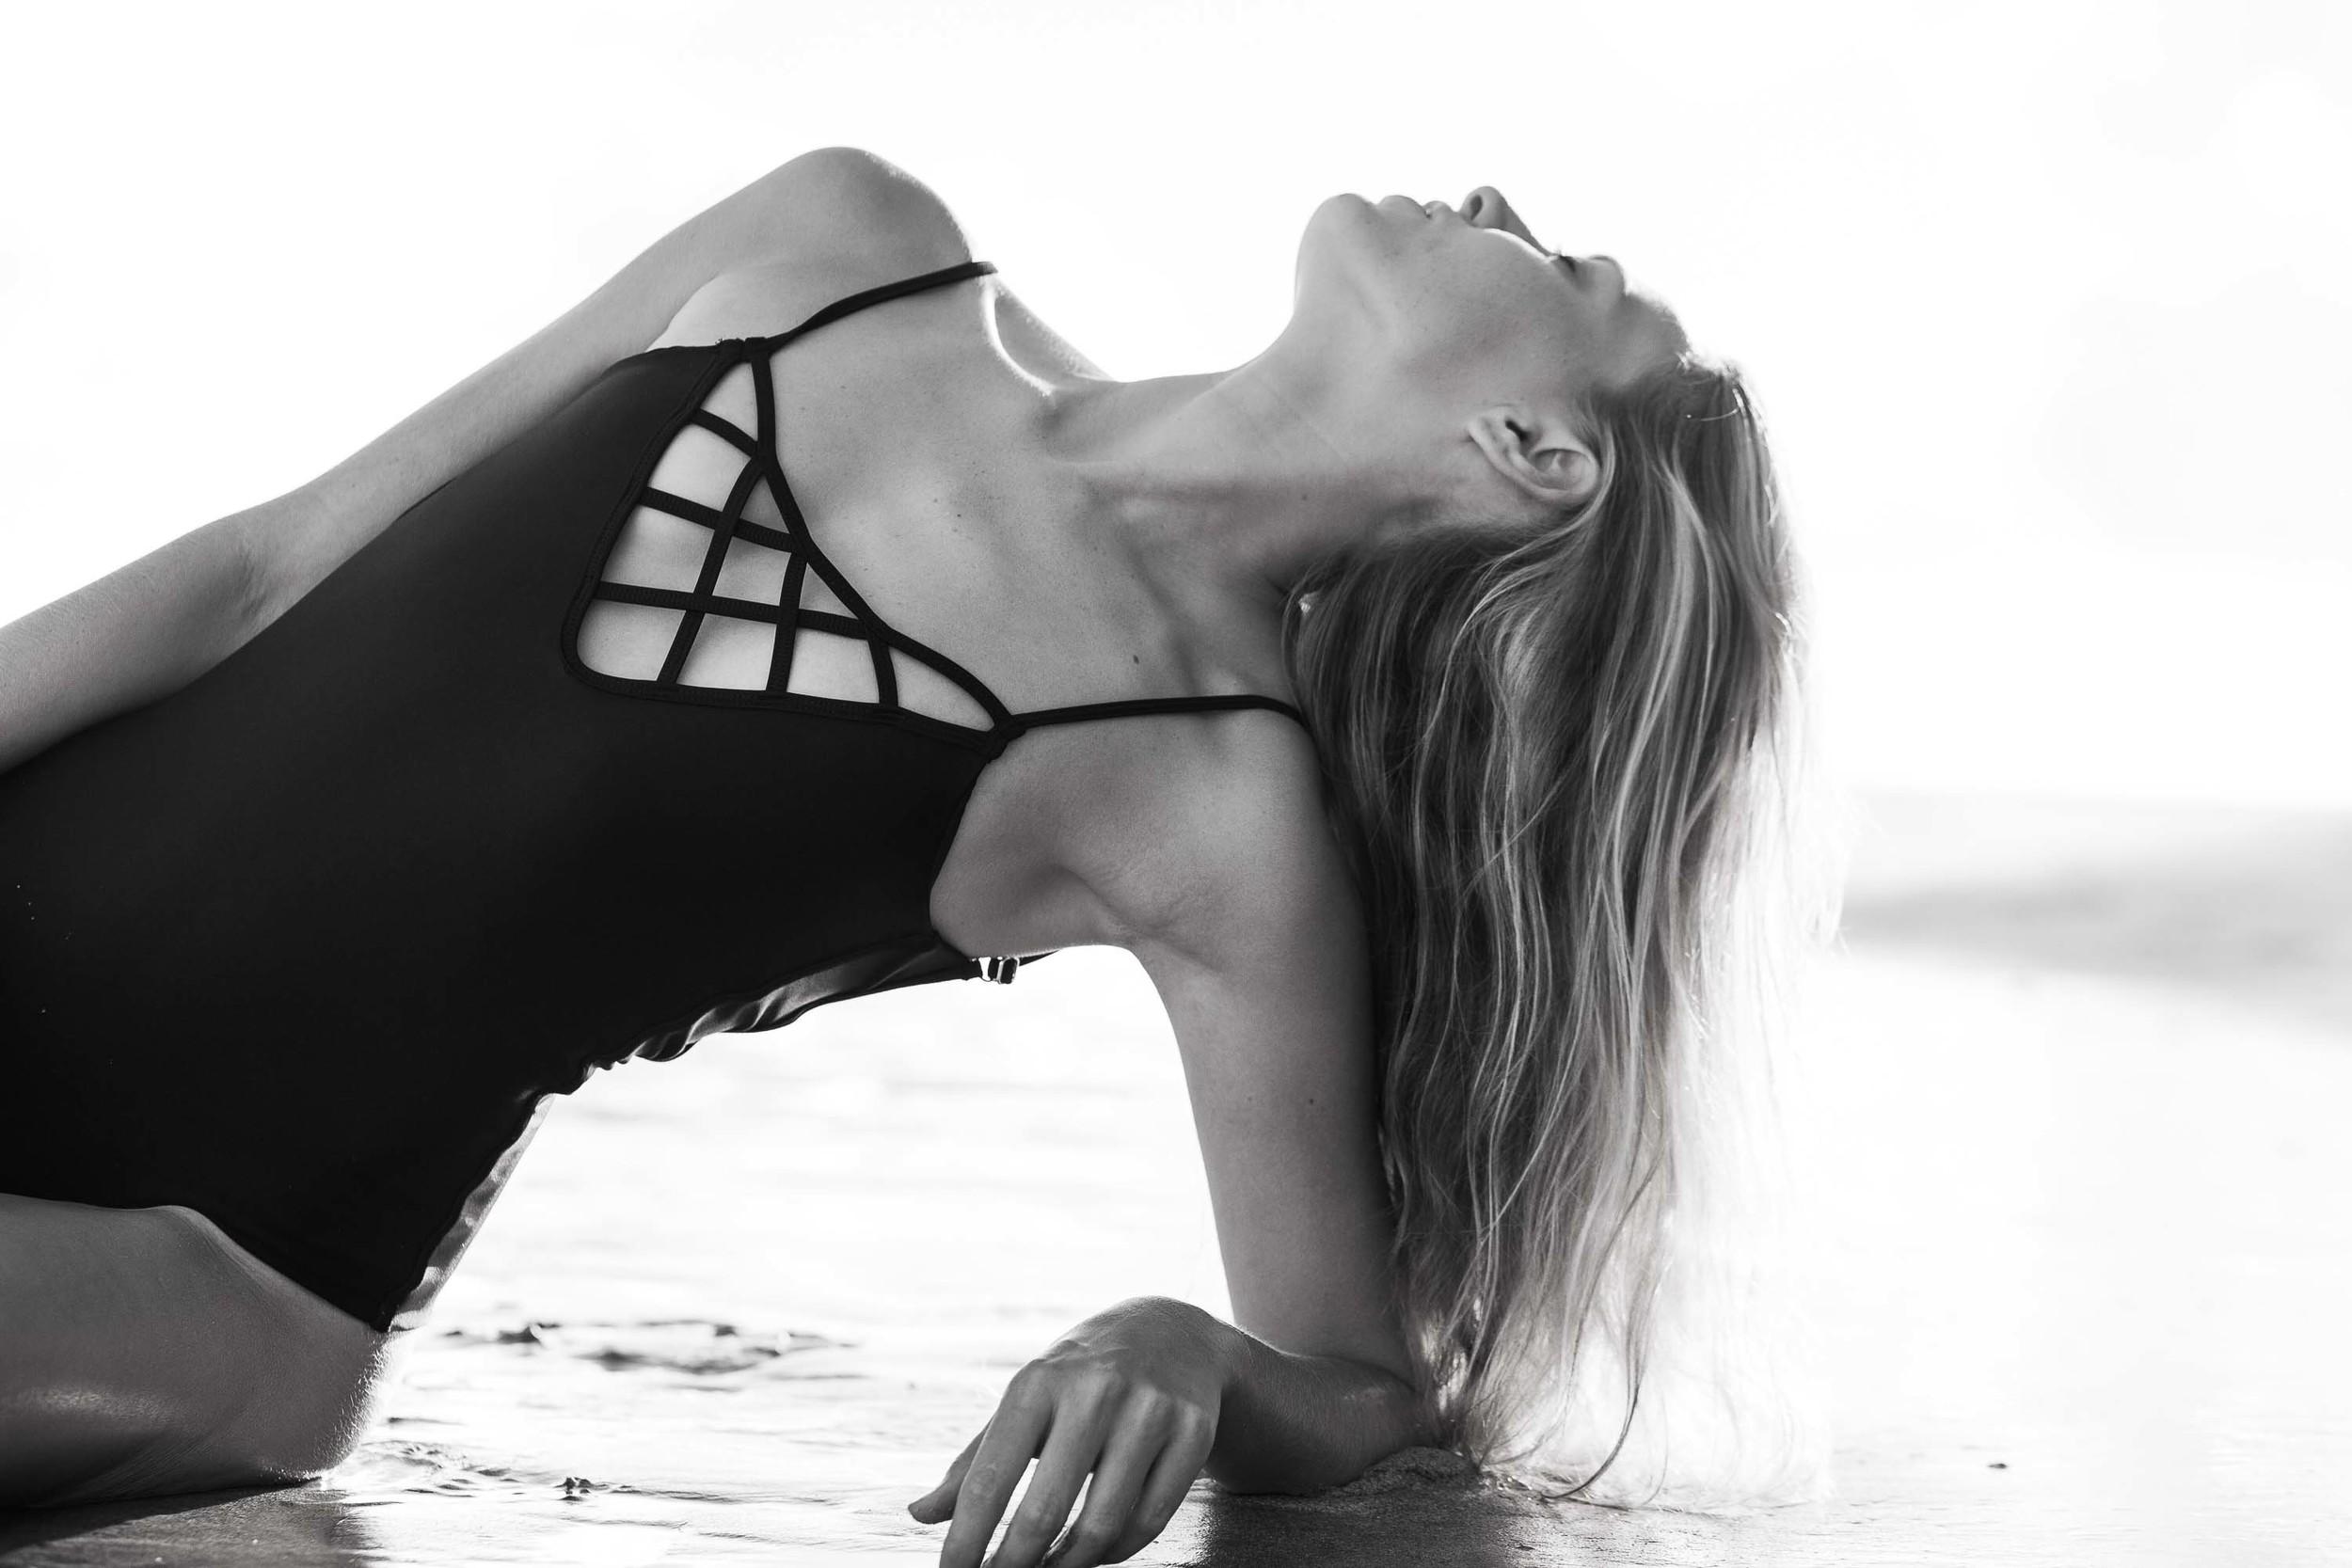 bryce-johnson-issademar-swimwear-gabby harrington-9.jpg